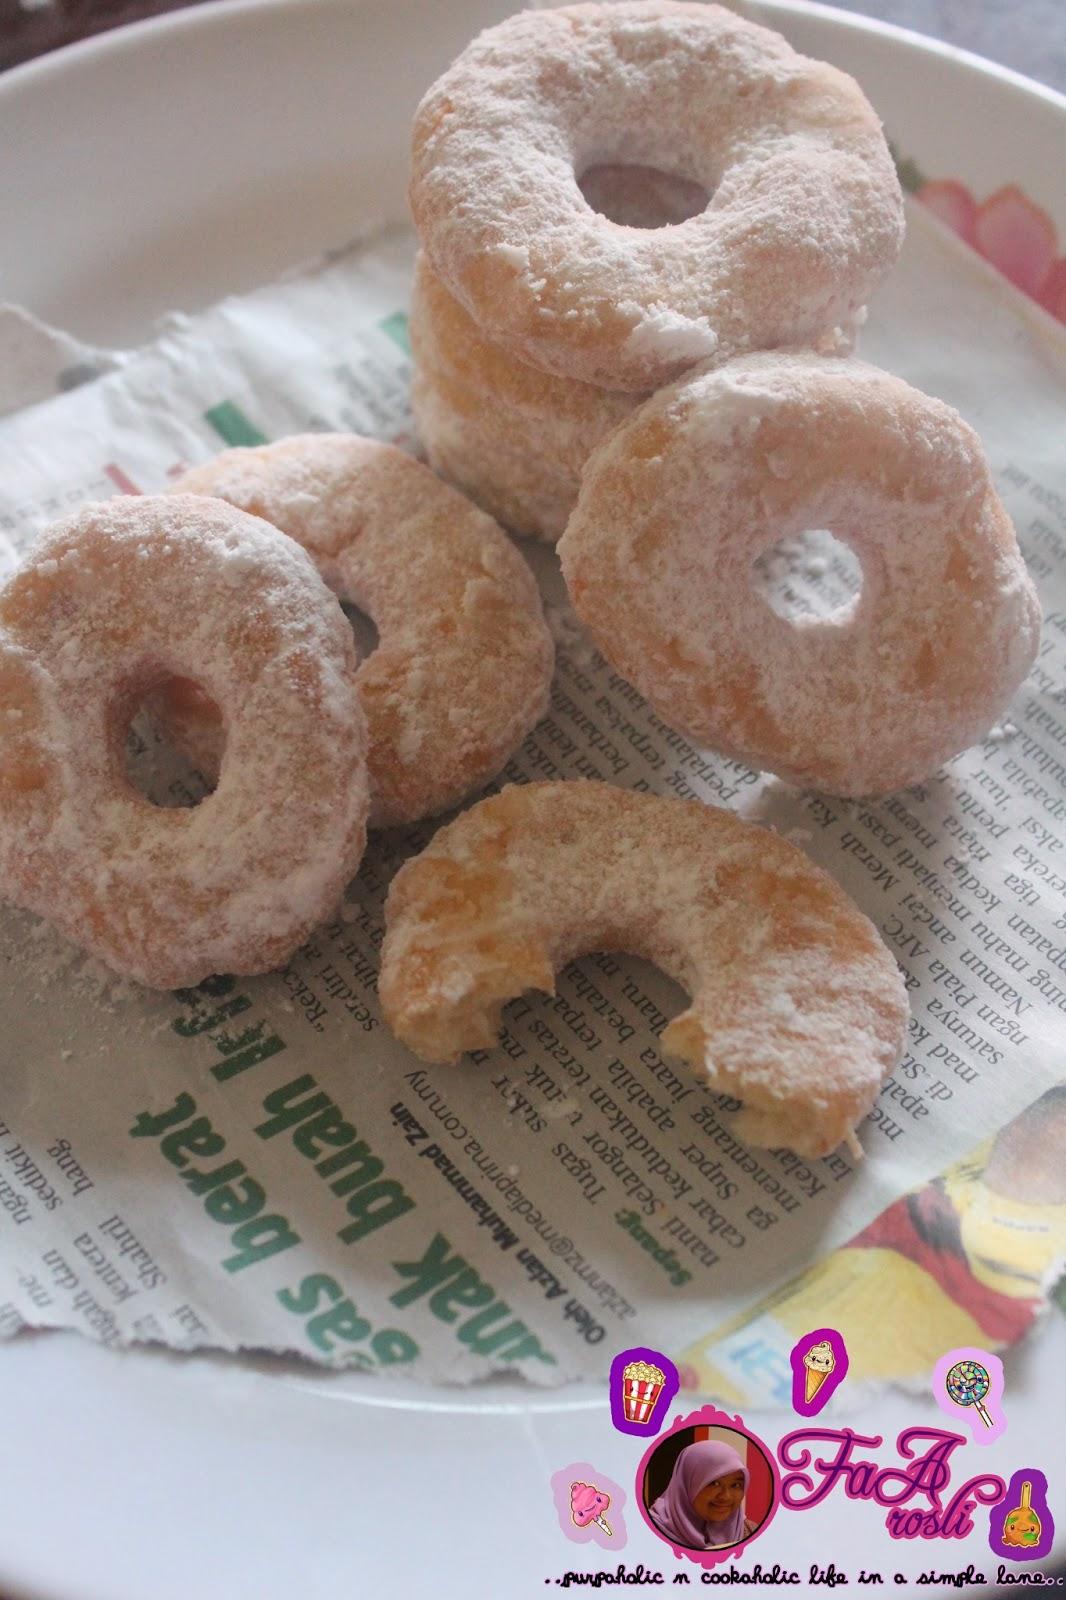 faa.rosli: Donut tanpa Yis. senang!!